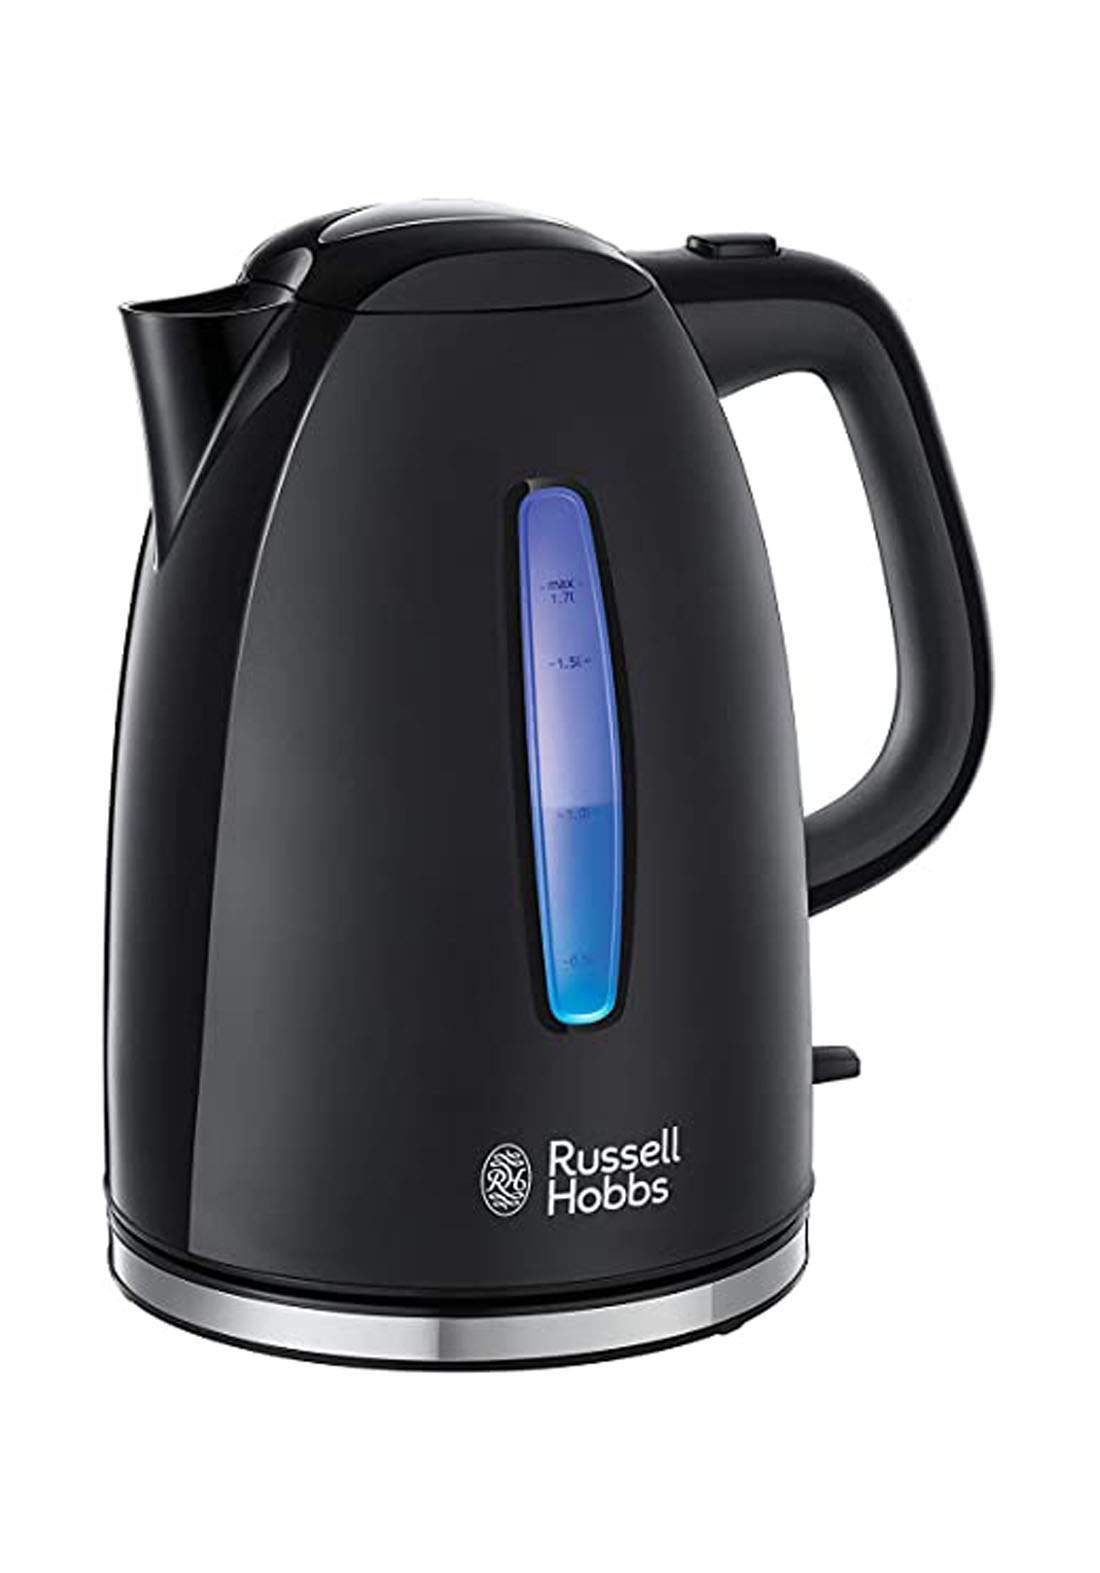 Russell hobbs 22591 Electrical kettle  غلاية